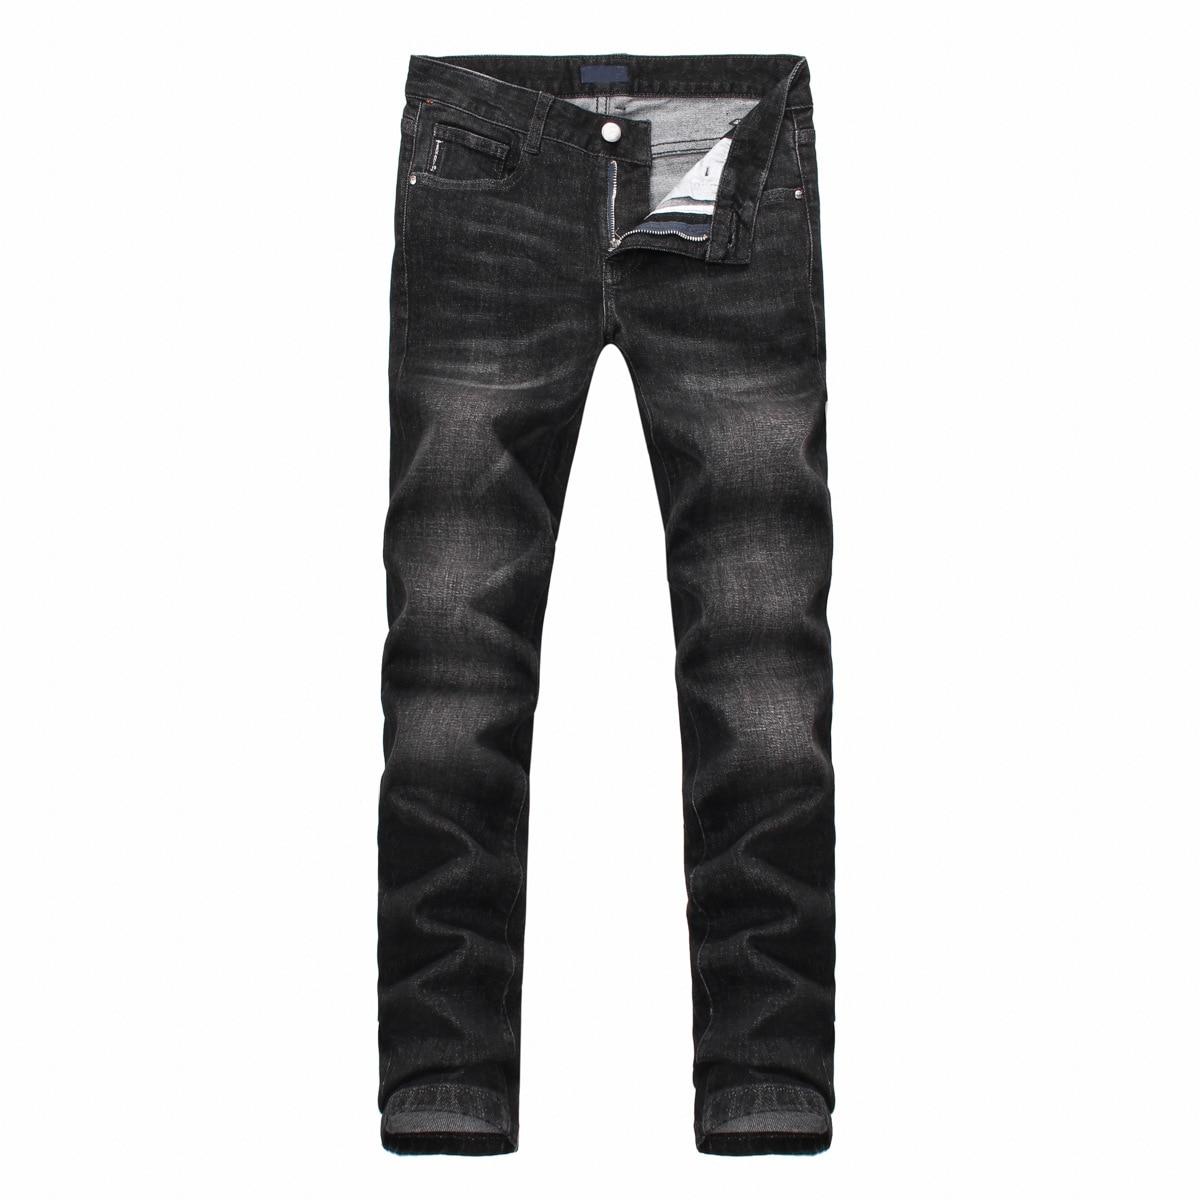 купить Freeshopping High Quality Fashion Men Jeans New Arrival Design Slim Fit Fashion Jeans For Man Good Quality Black Elastic pants по цене 3693.32 рублей